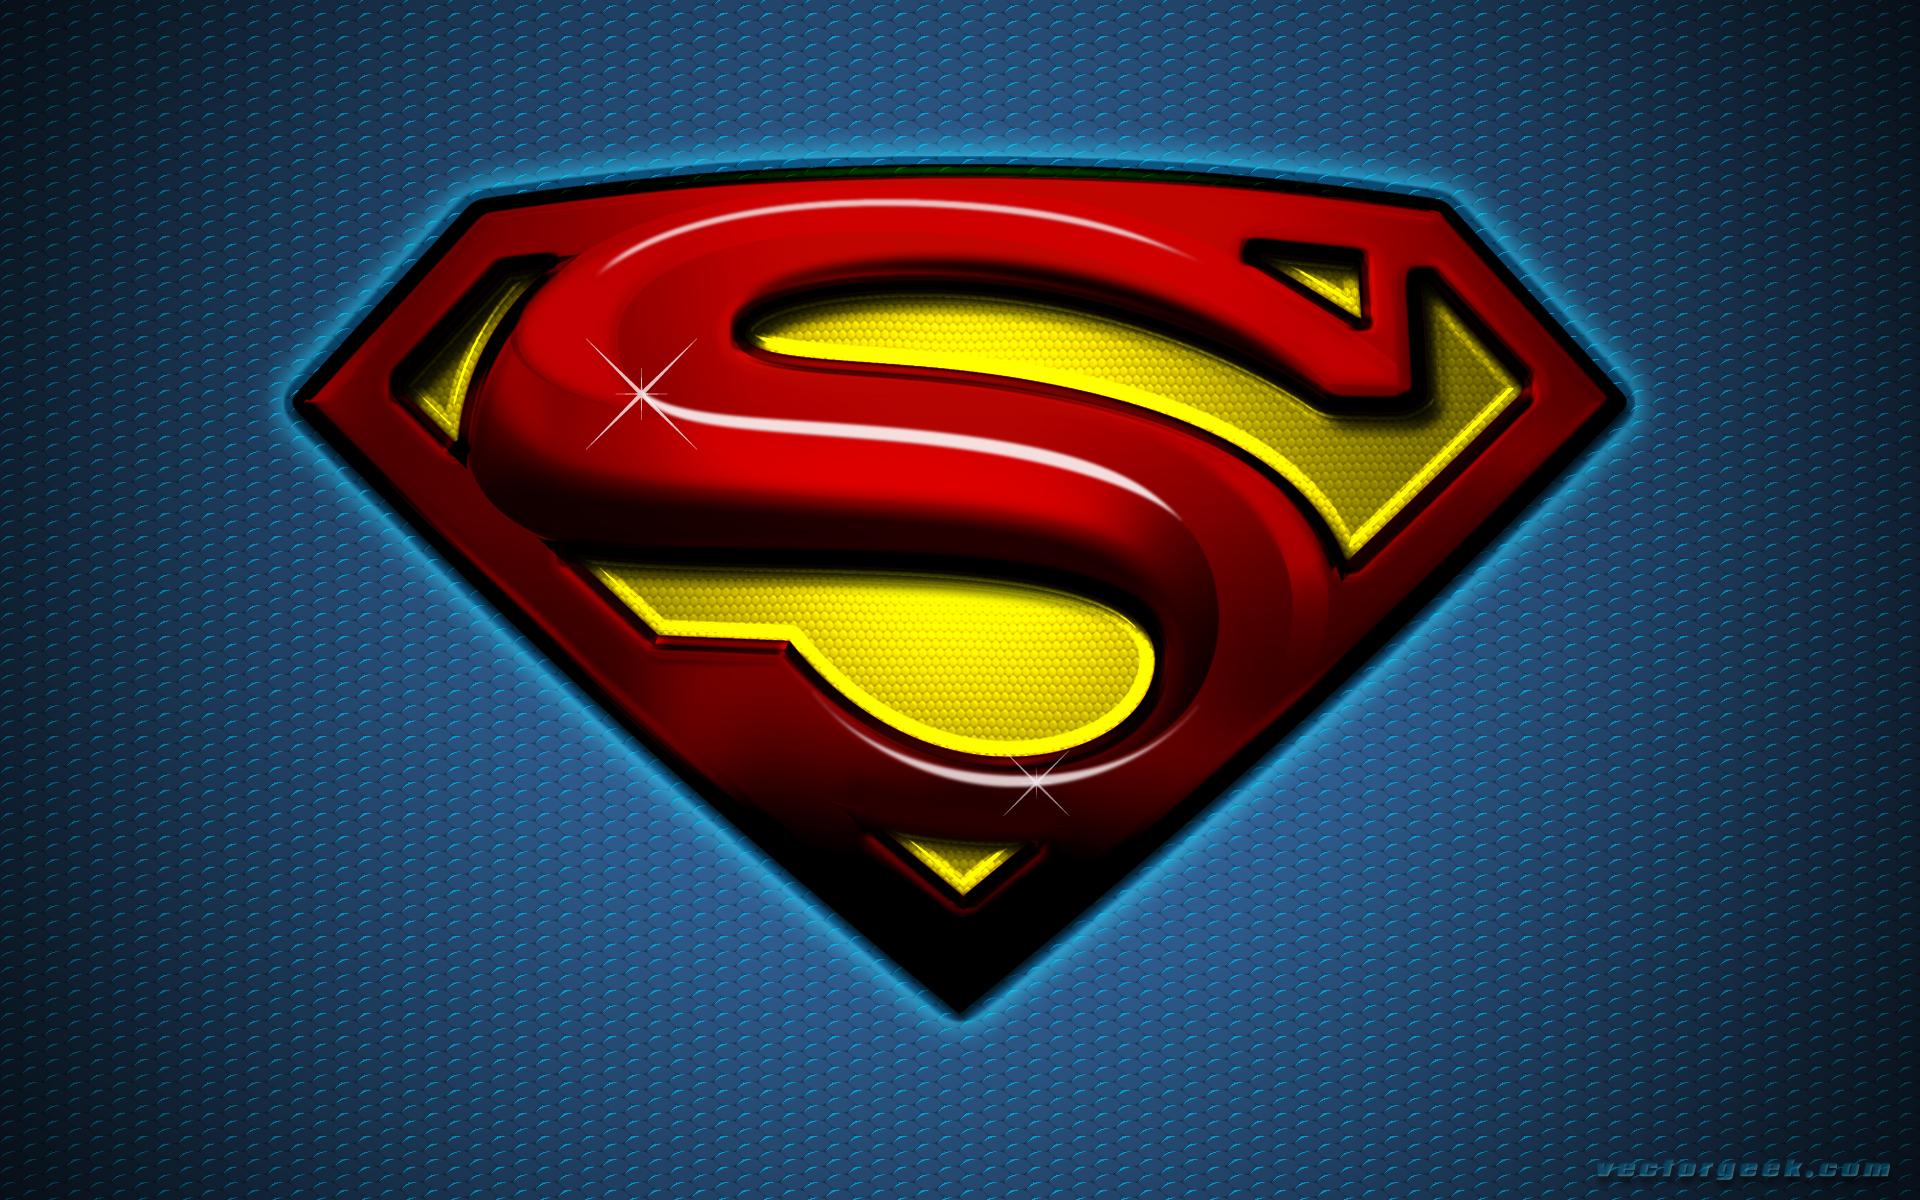 VG Superman wallpaper by vectorgeek 1920x1200